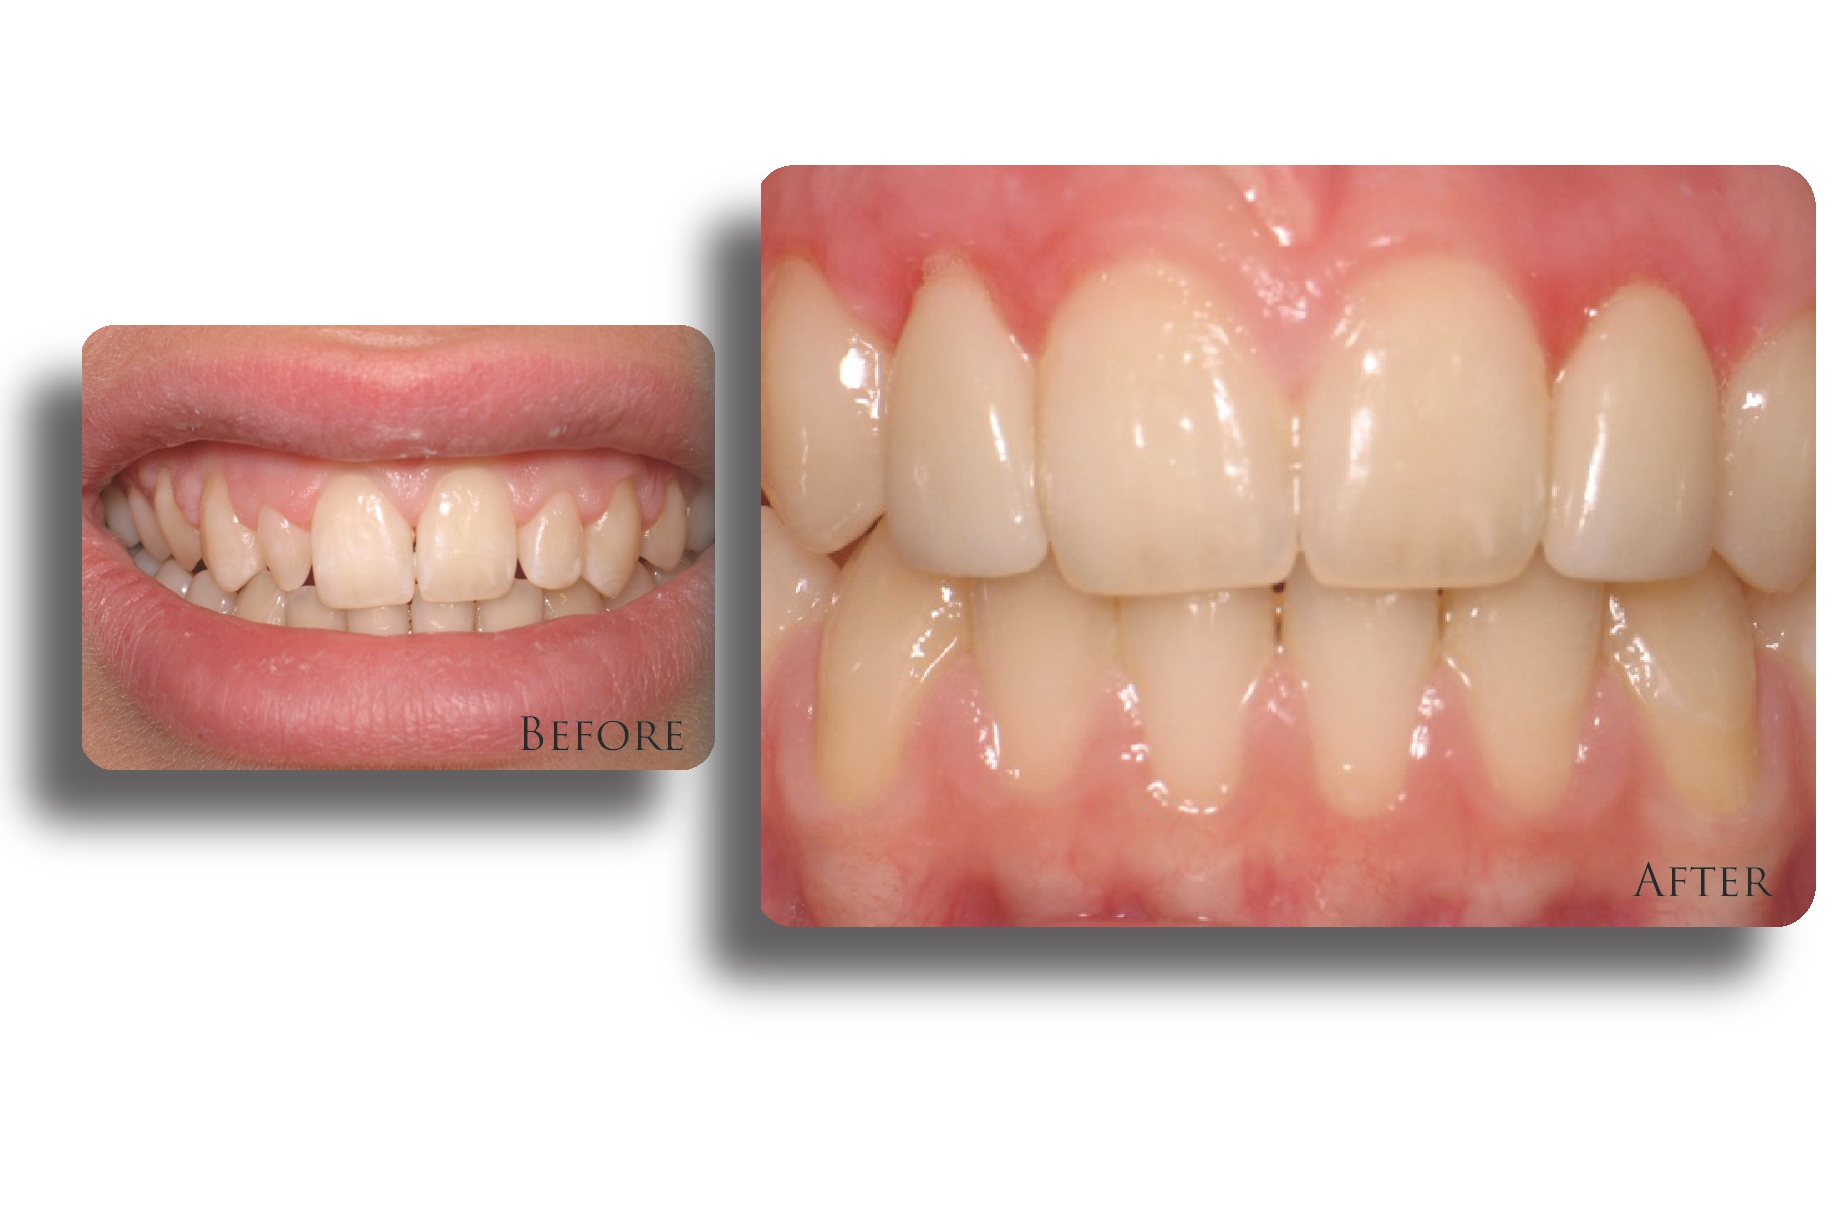 کامپوزیت دندان یا ارتودنسی؟